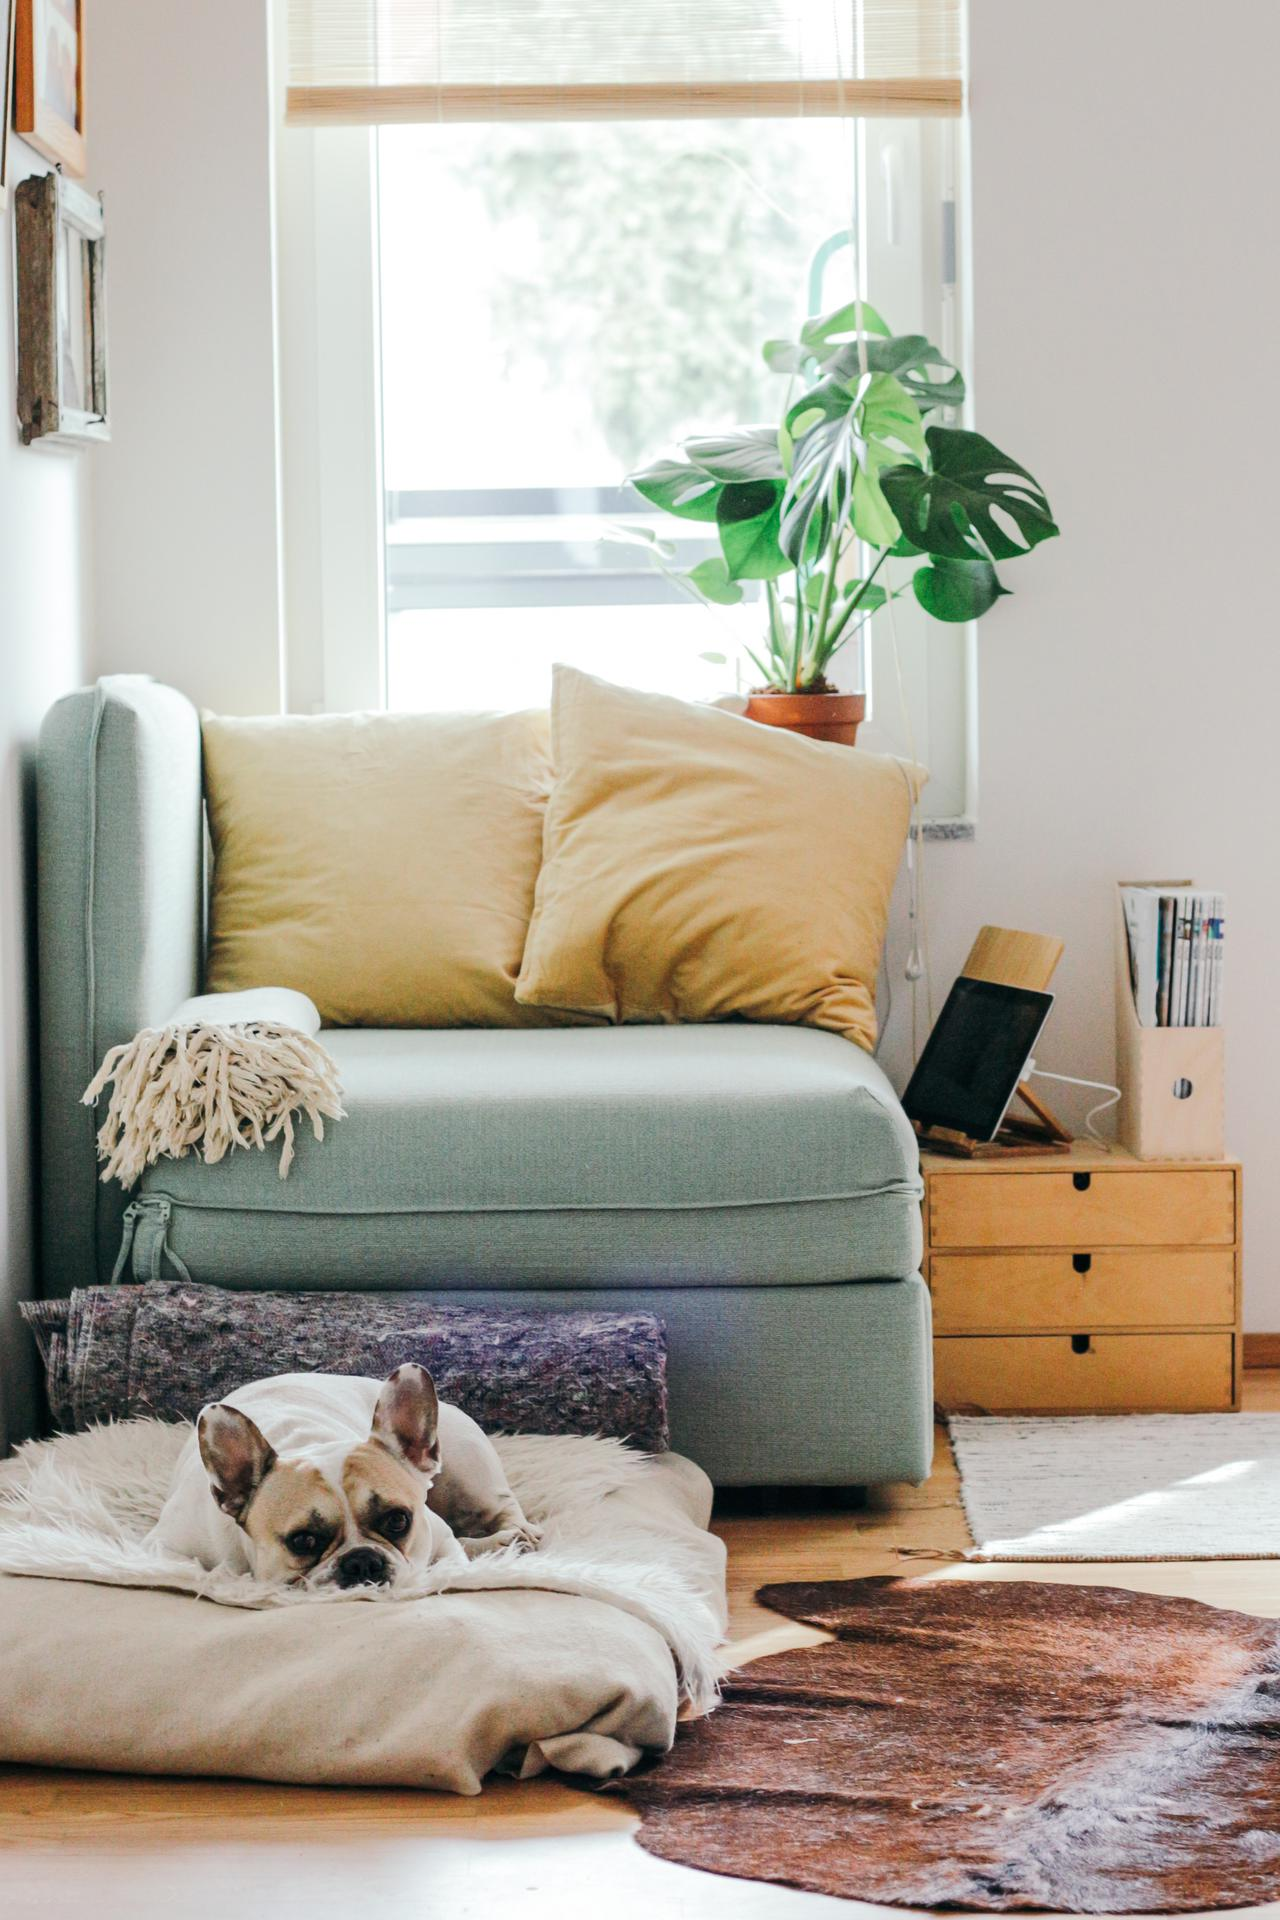 Home Treatment Program